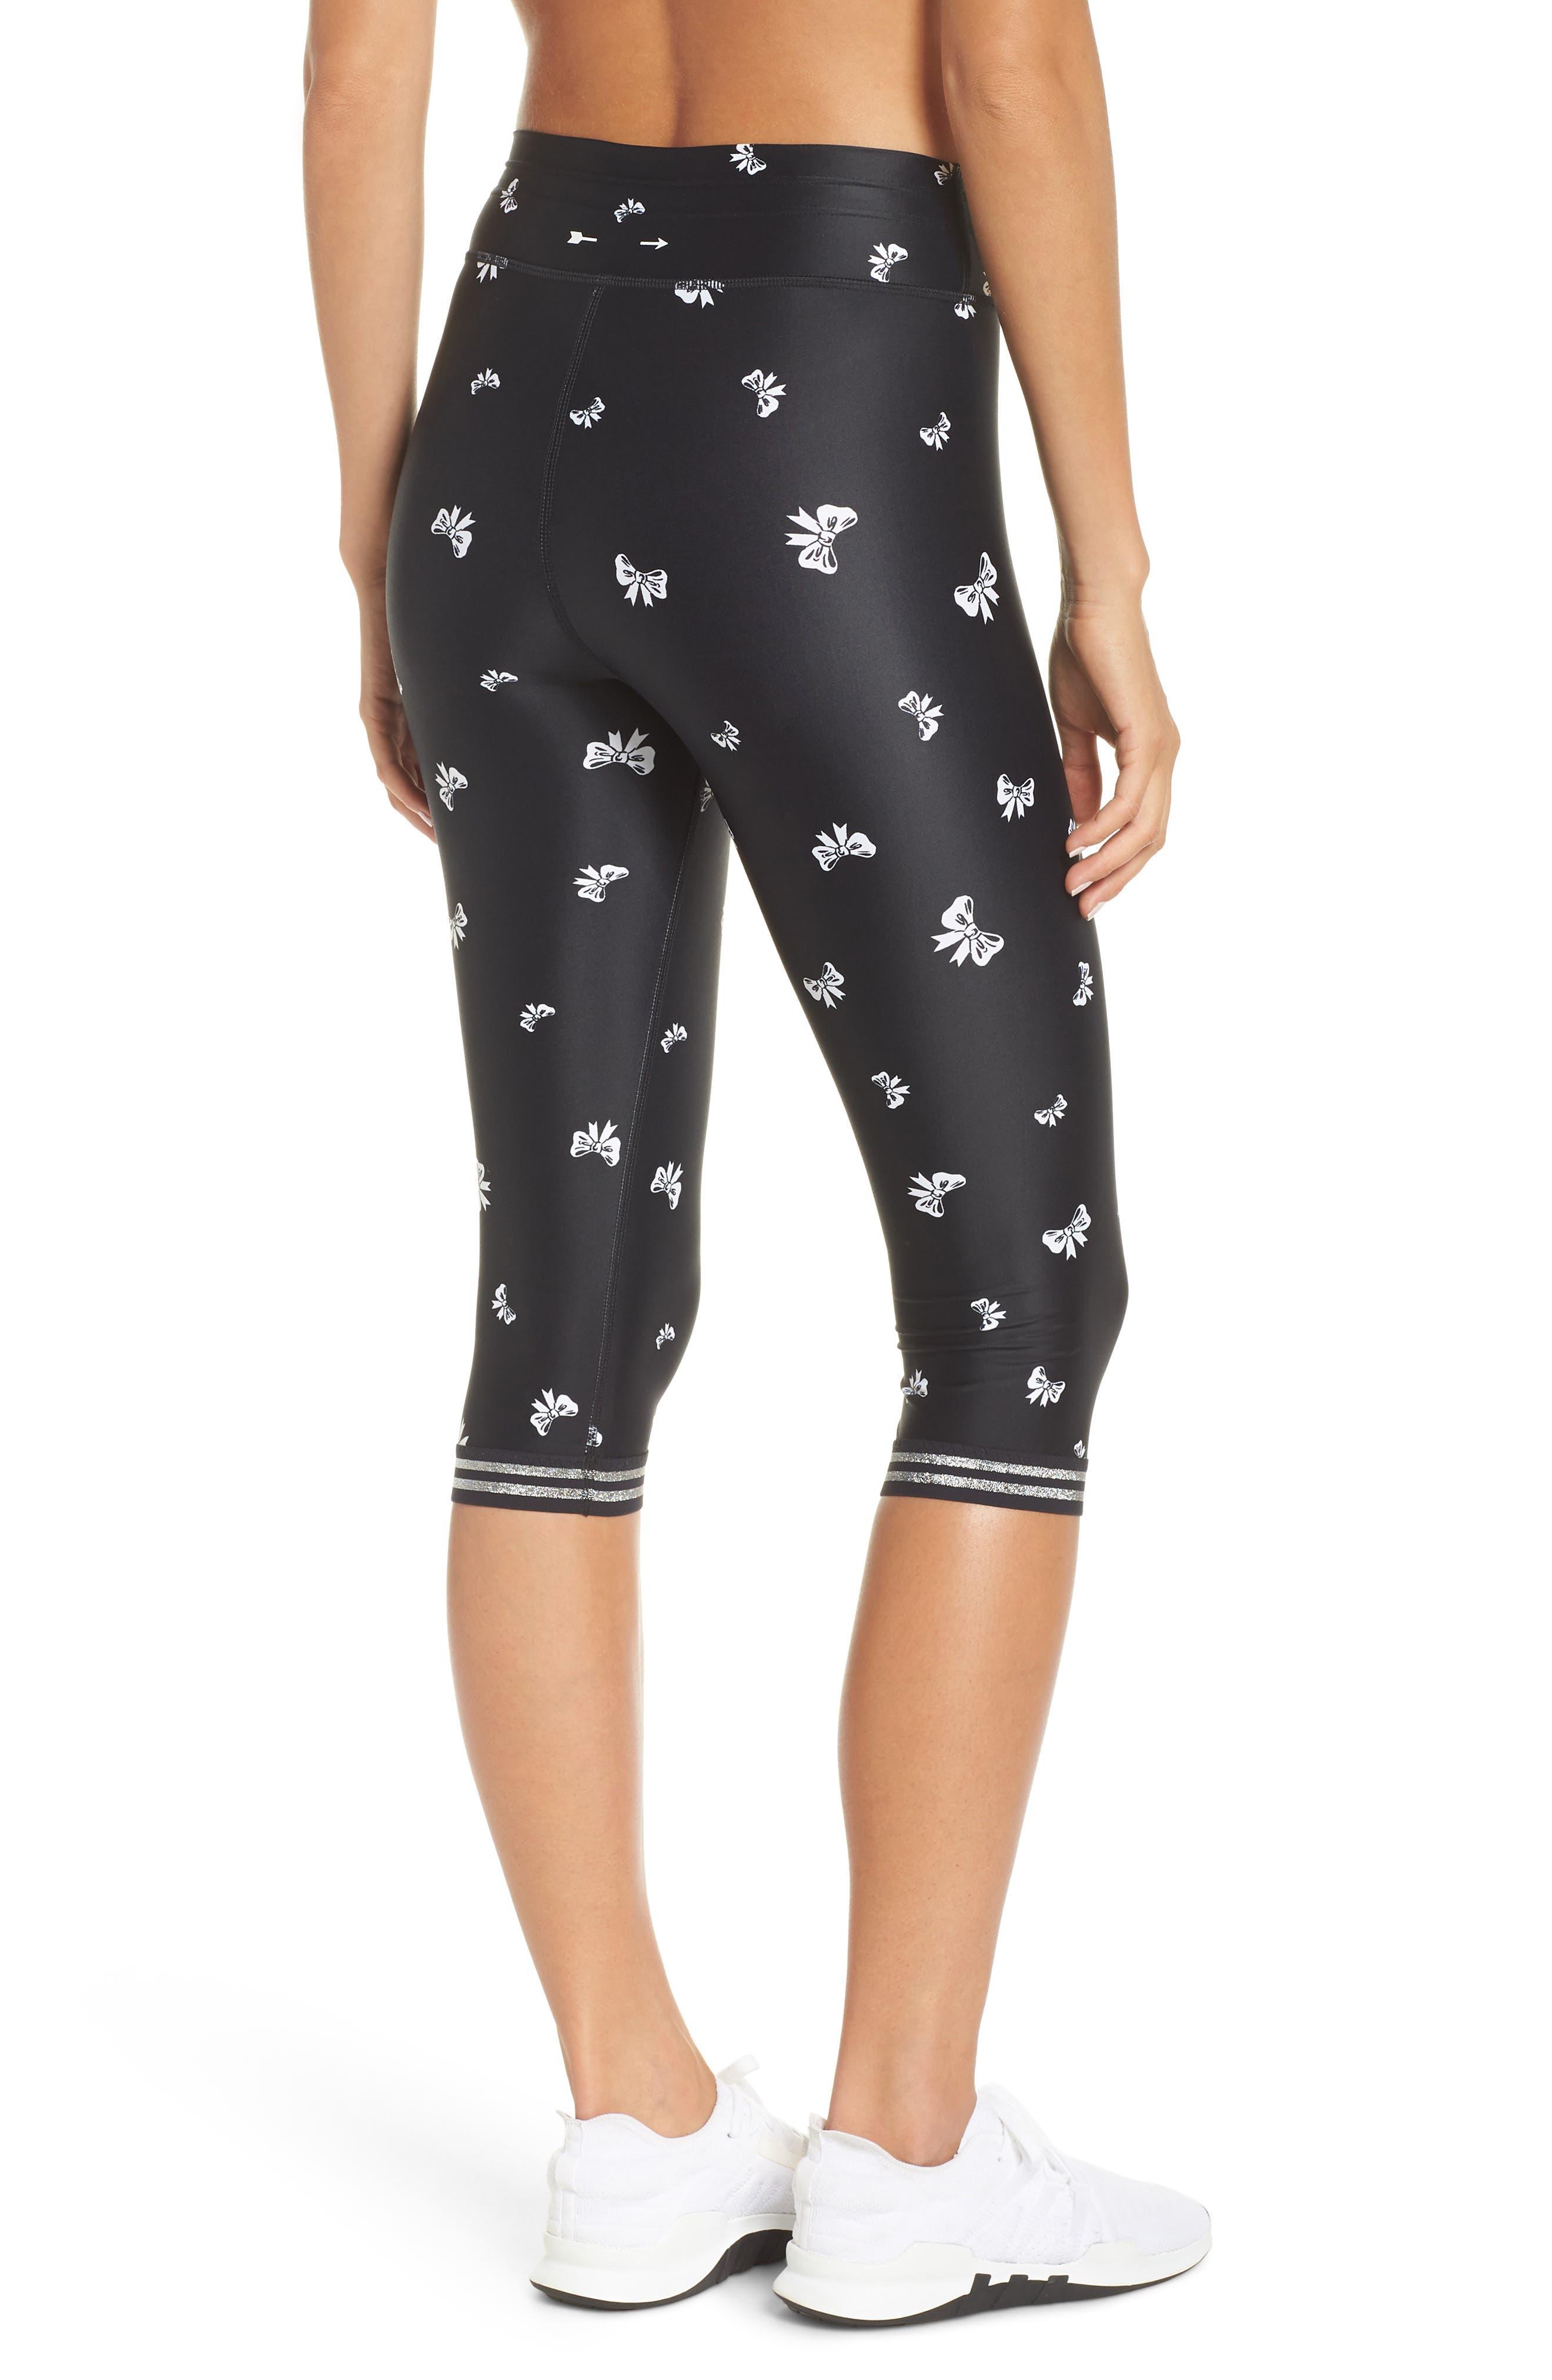 Bows Power Pant Crop Leggings,                             Alternate thumbnail 2, color,                             BLACK/ WHITE